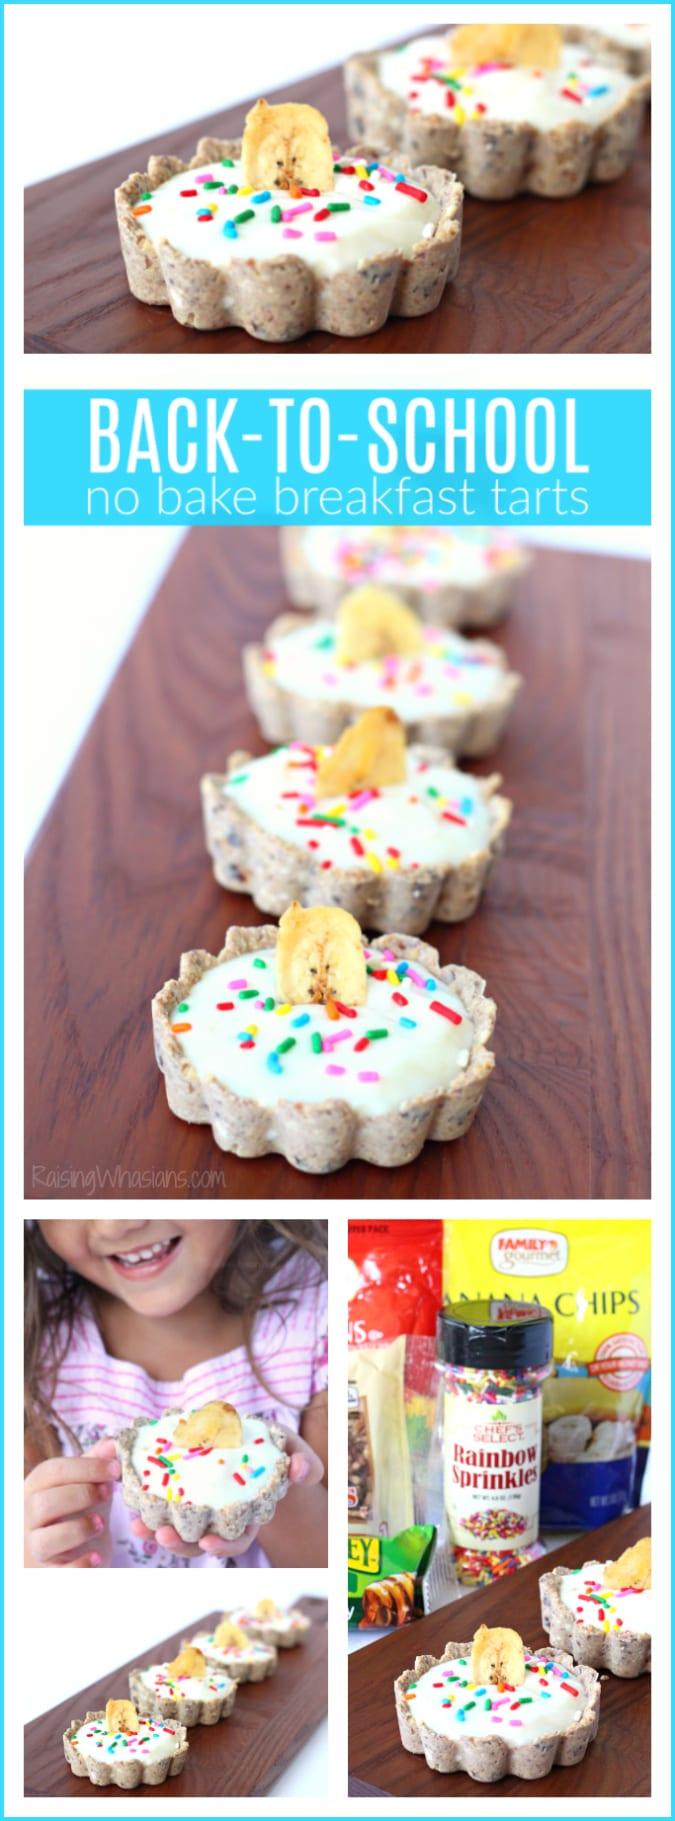 No bake breakfast tarts pinterest